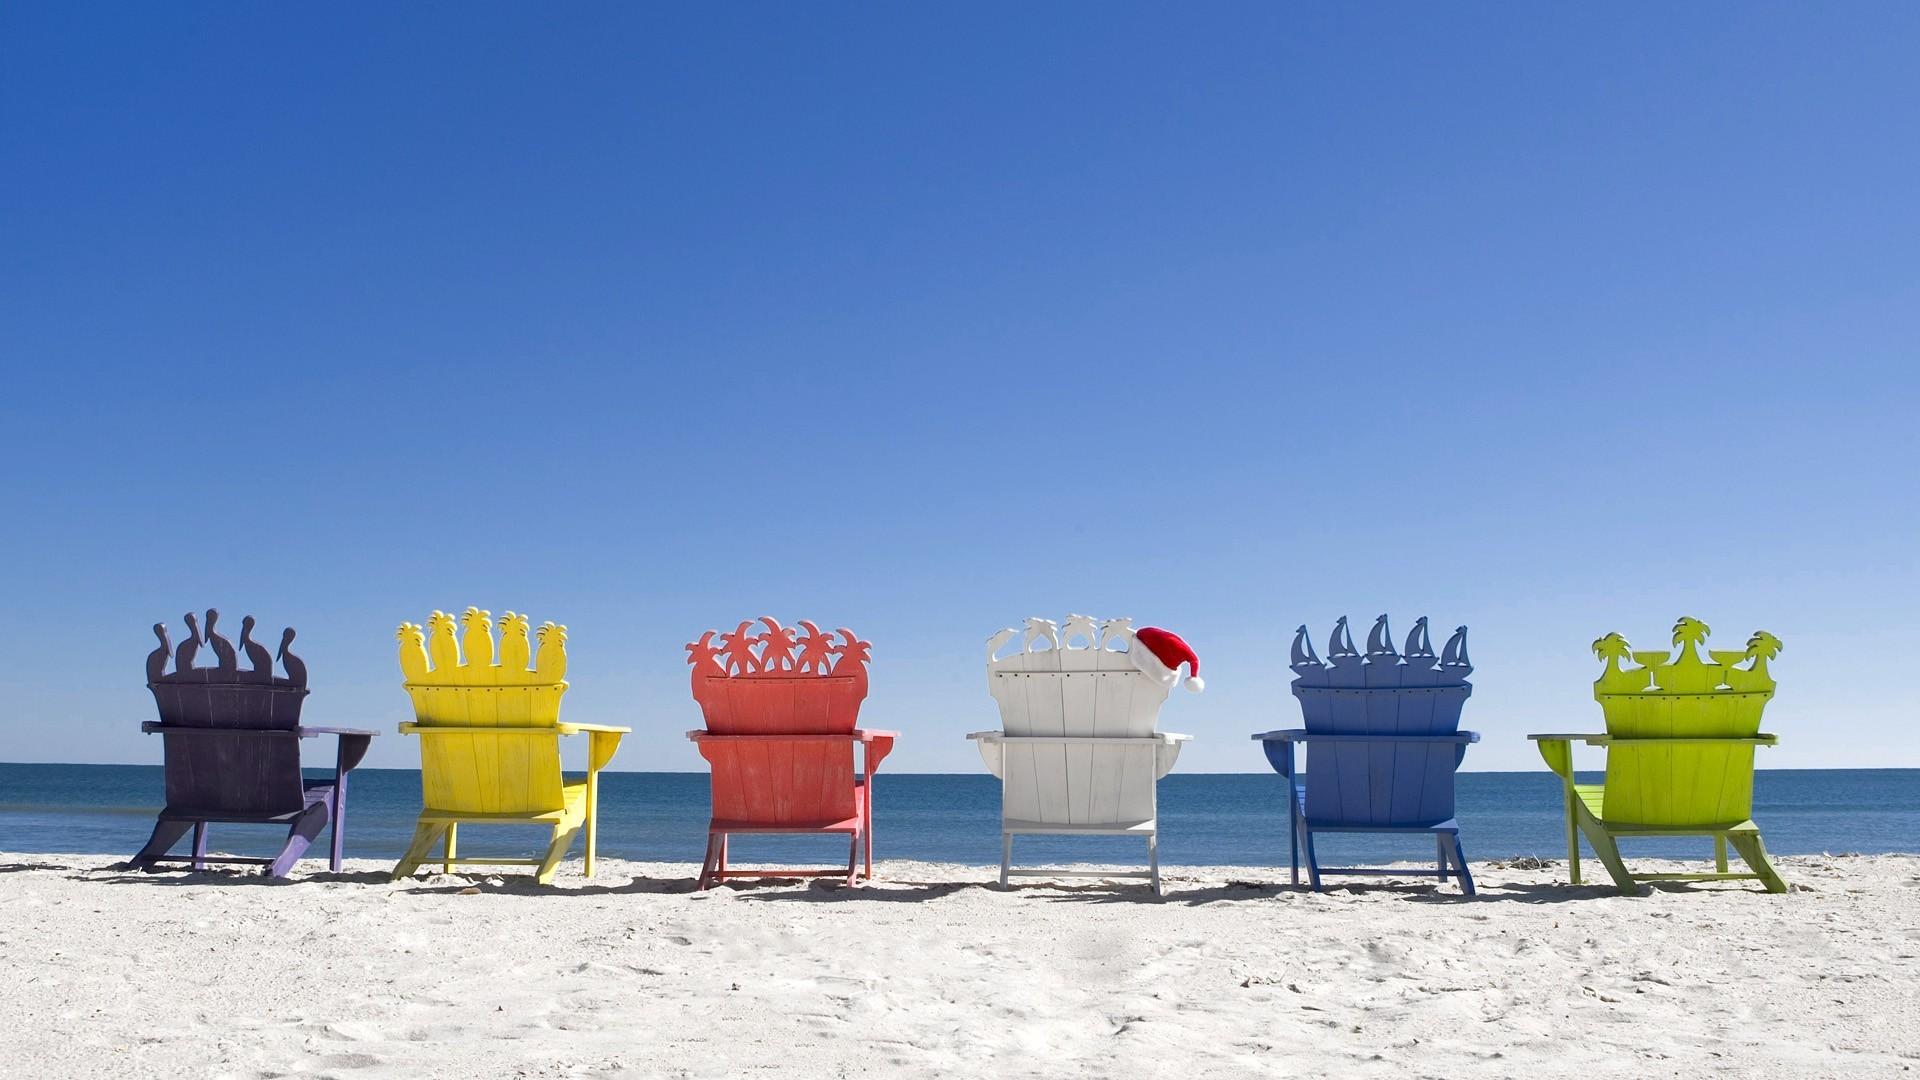 Myrtle Beach Wallpapers | Download Free Desktop Wallpaper Images .